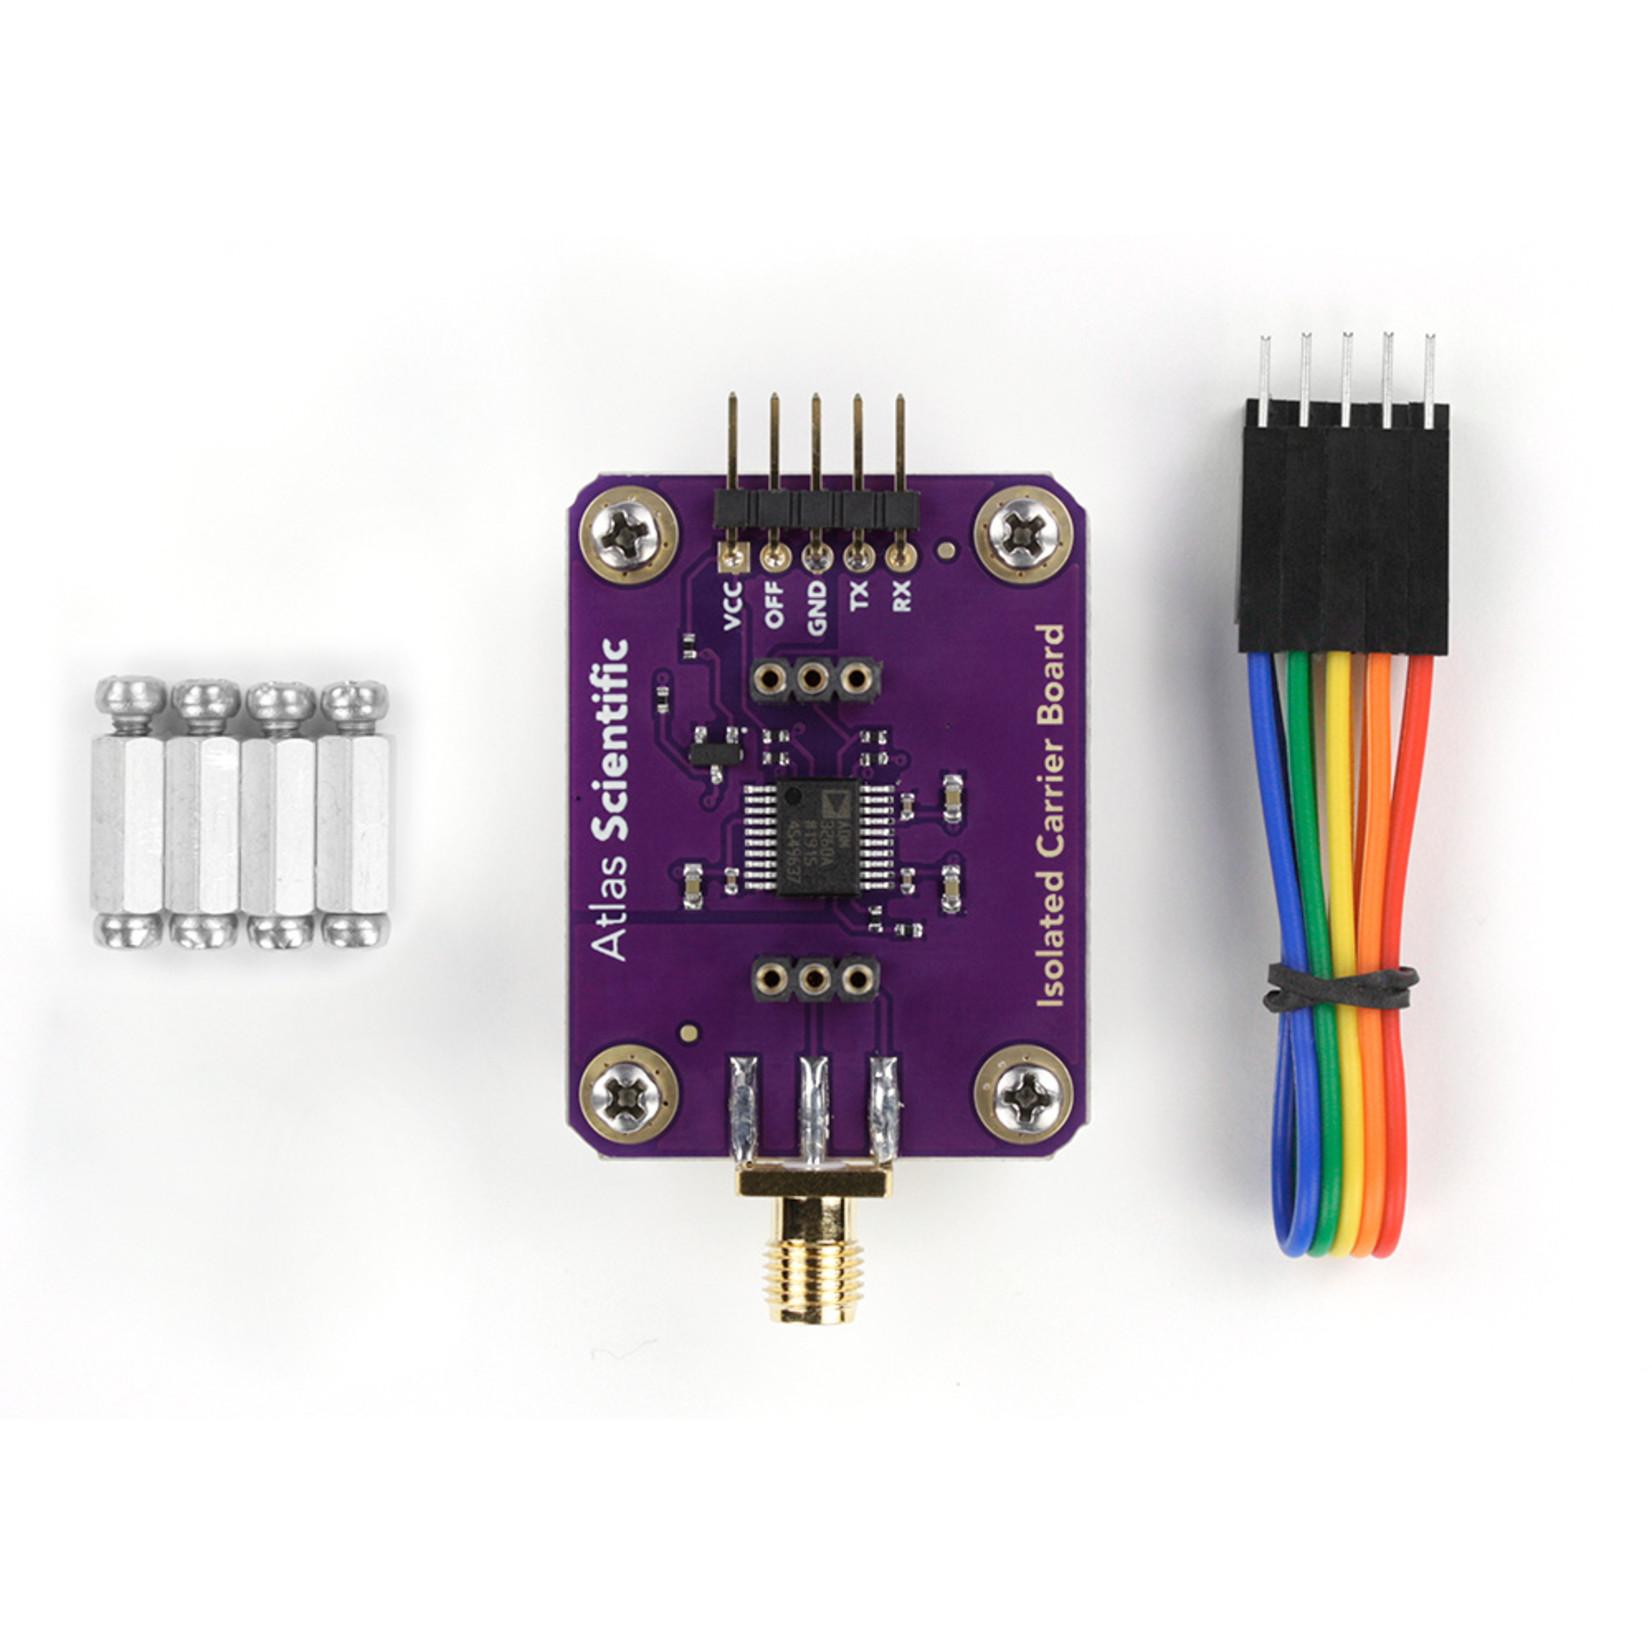 Atlas Scientific Geleidbaarheid Sensor K 1.0 Kit